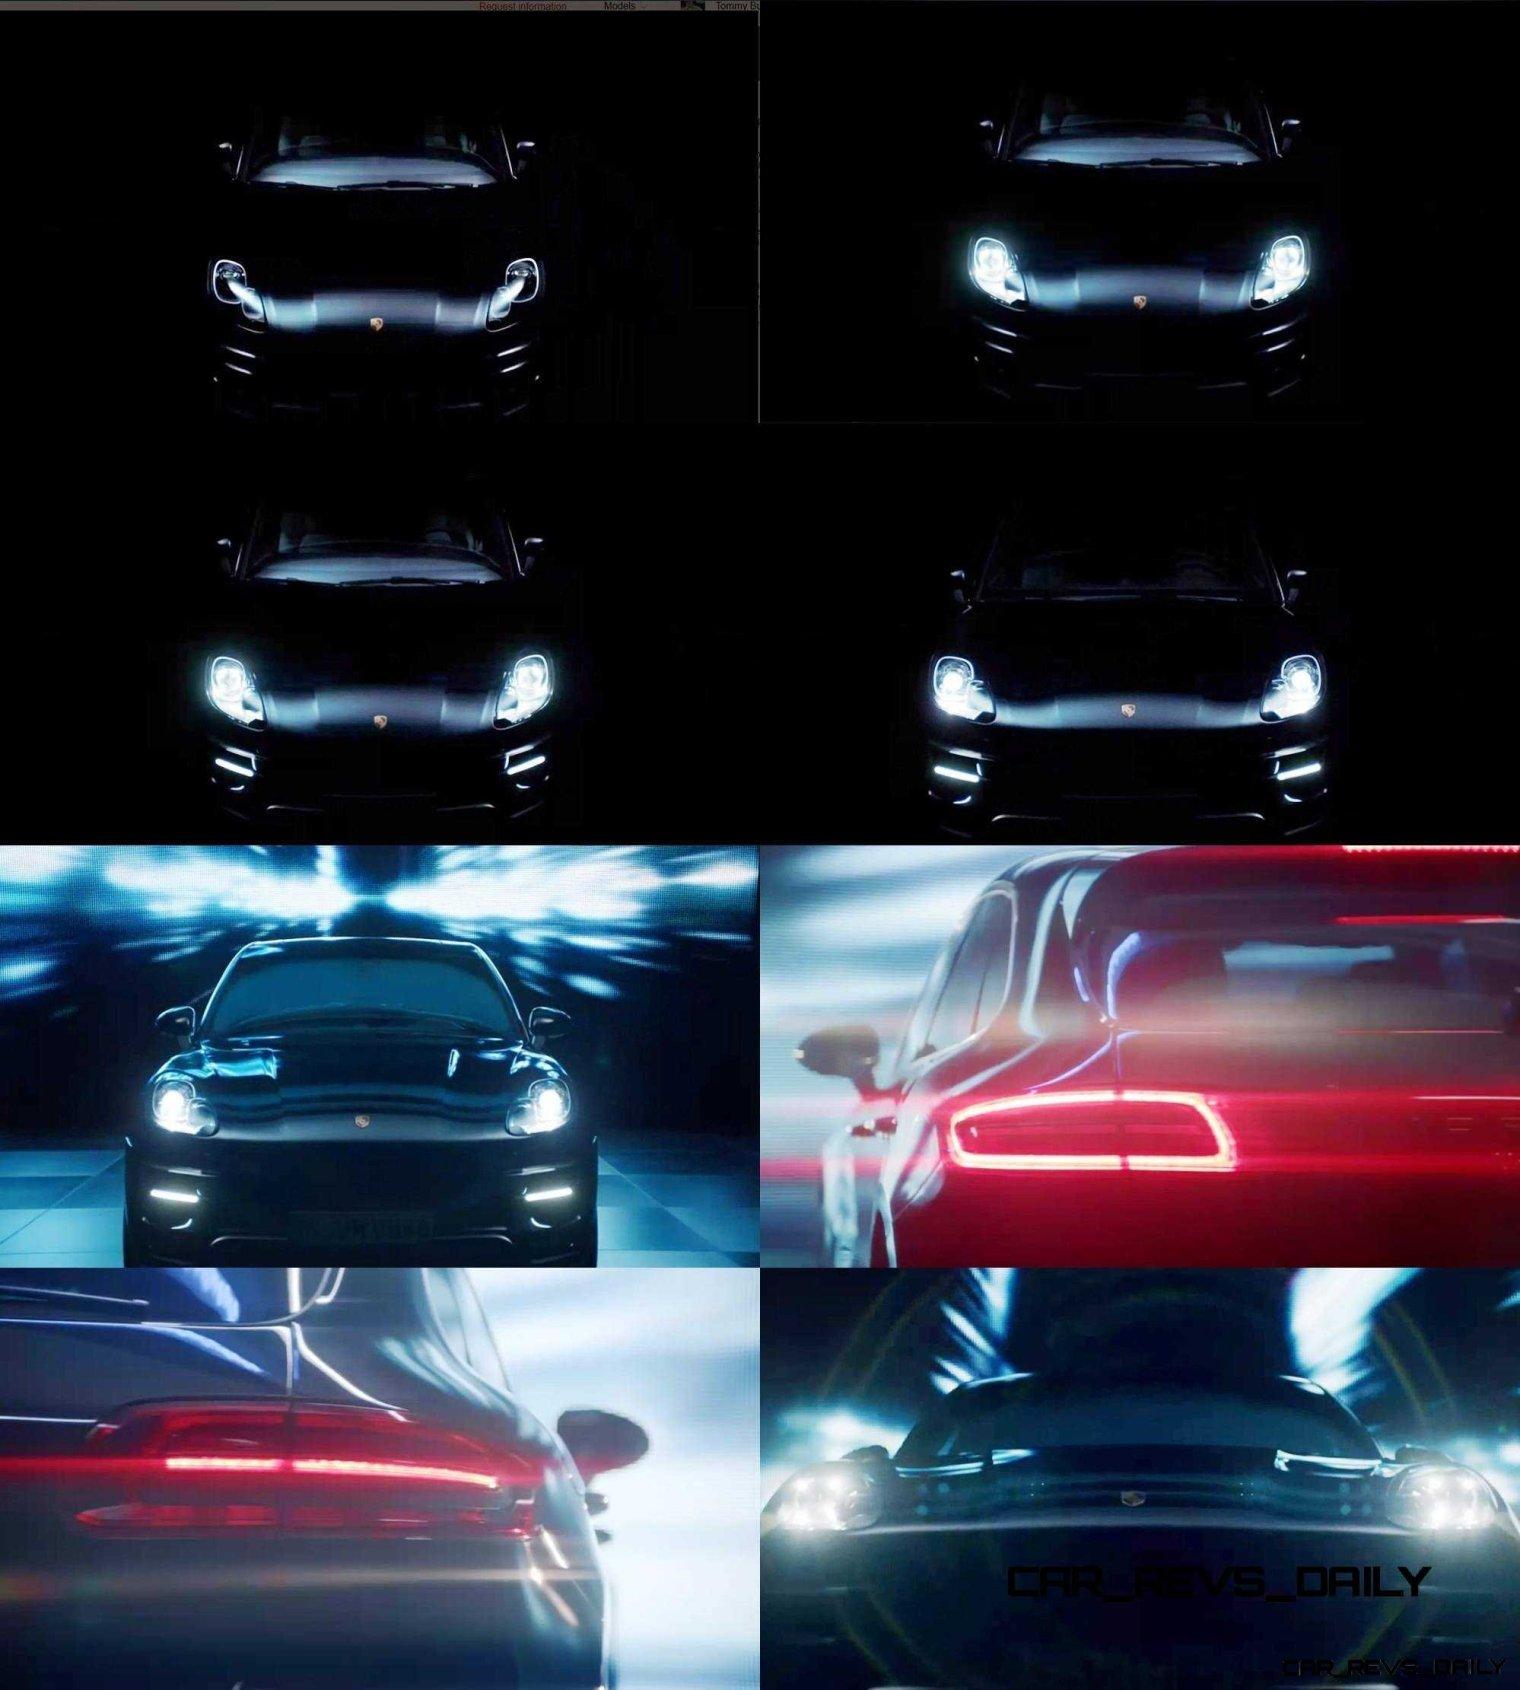 2015 Porsche Macan - Latest Images - CarRevsDaily-tile2